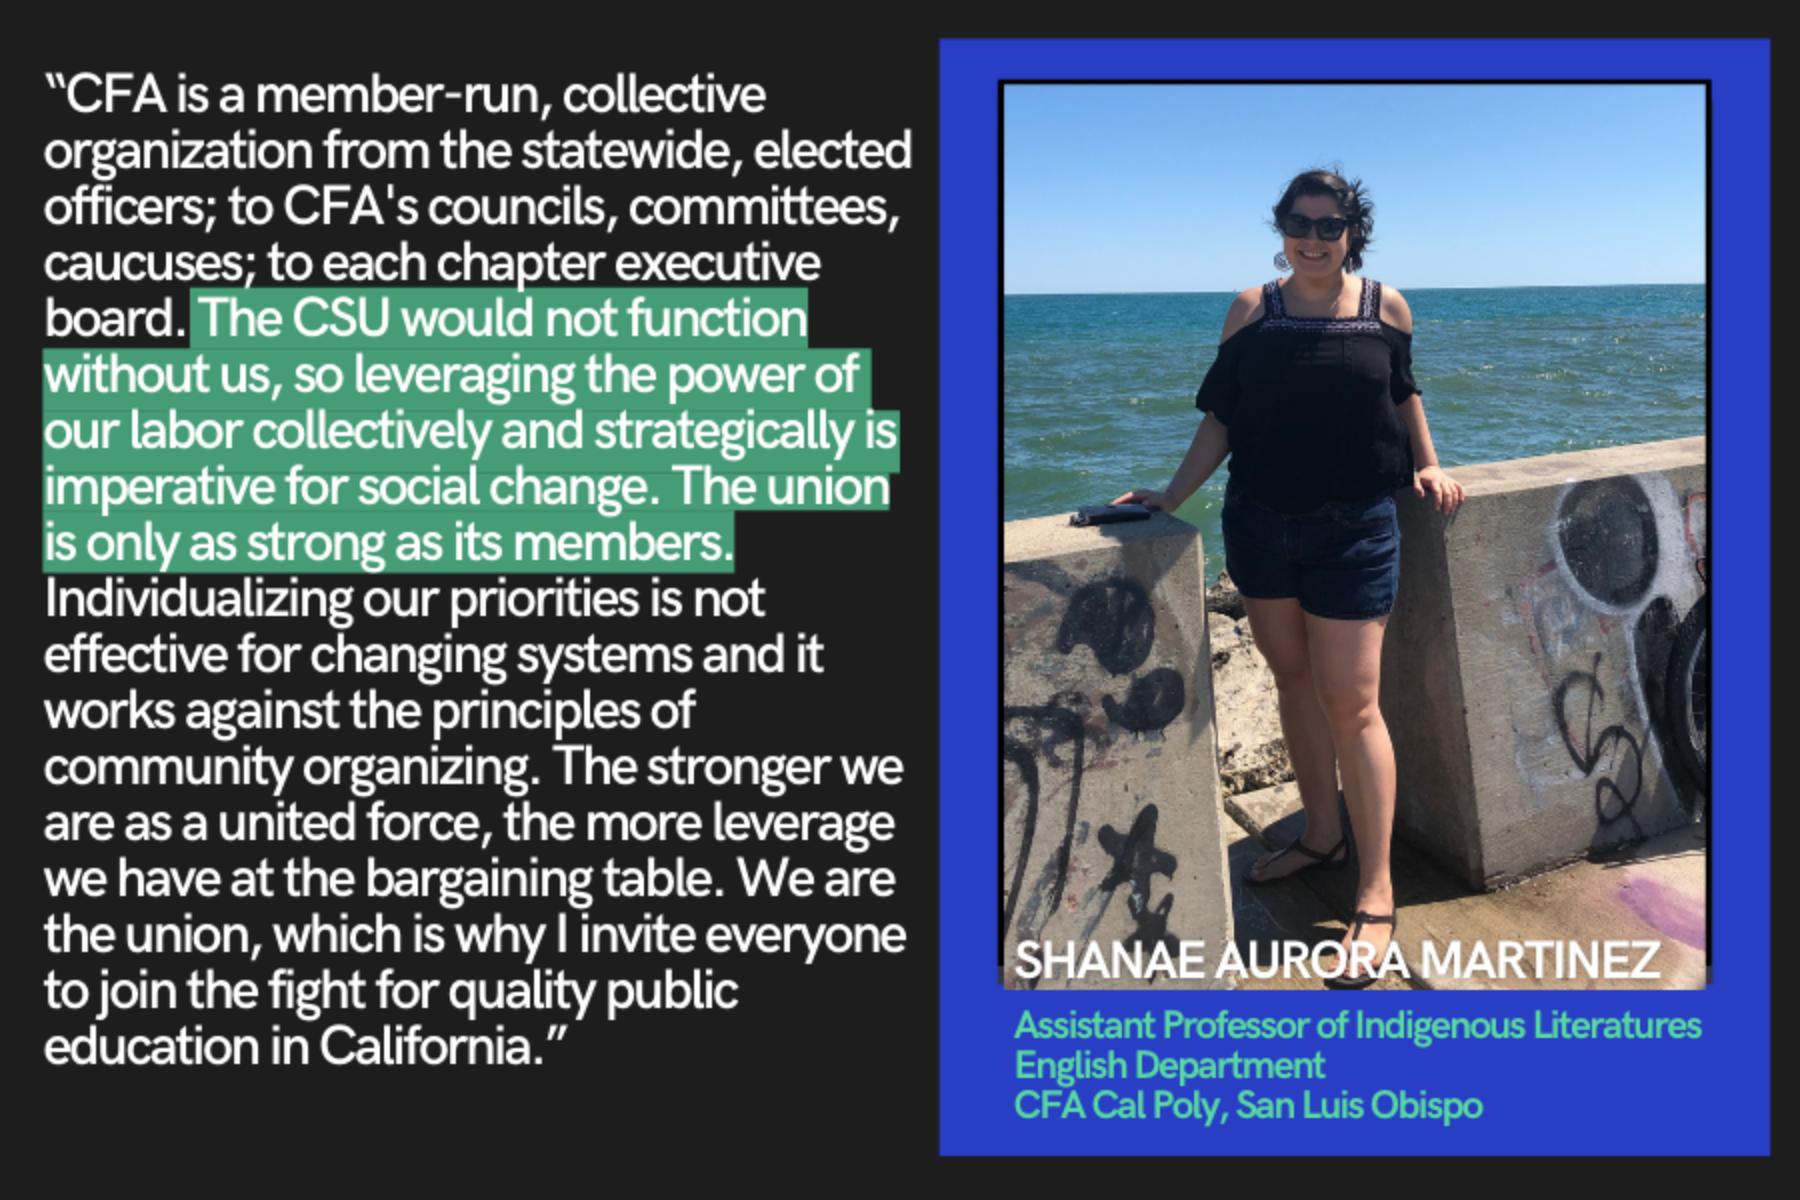 Shanae Aurora Martinez talks about why she joined CFA.